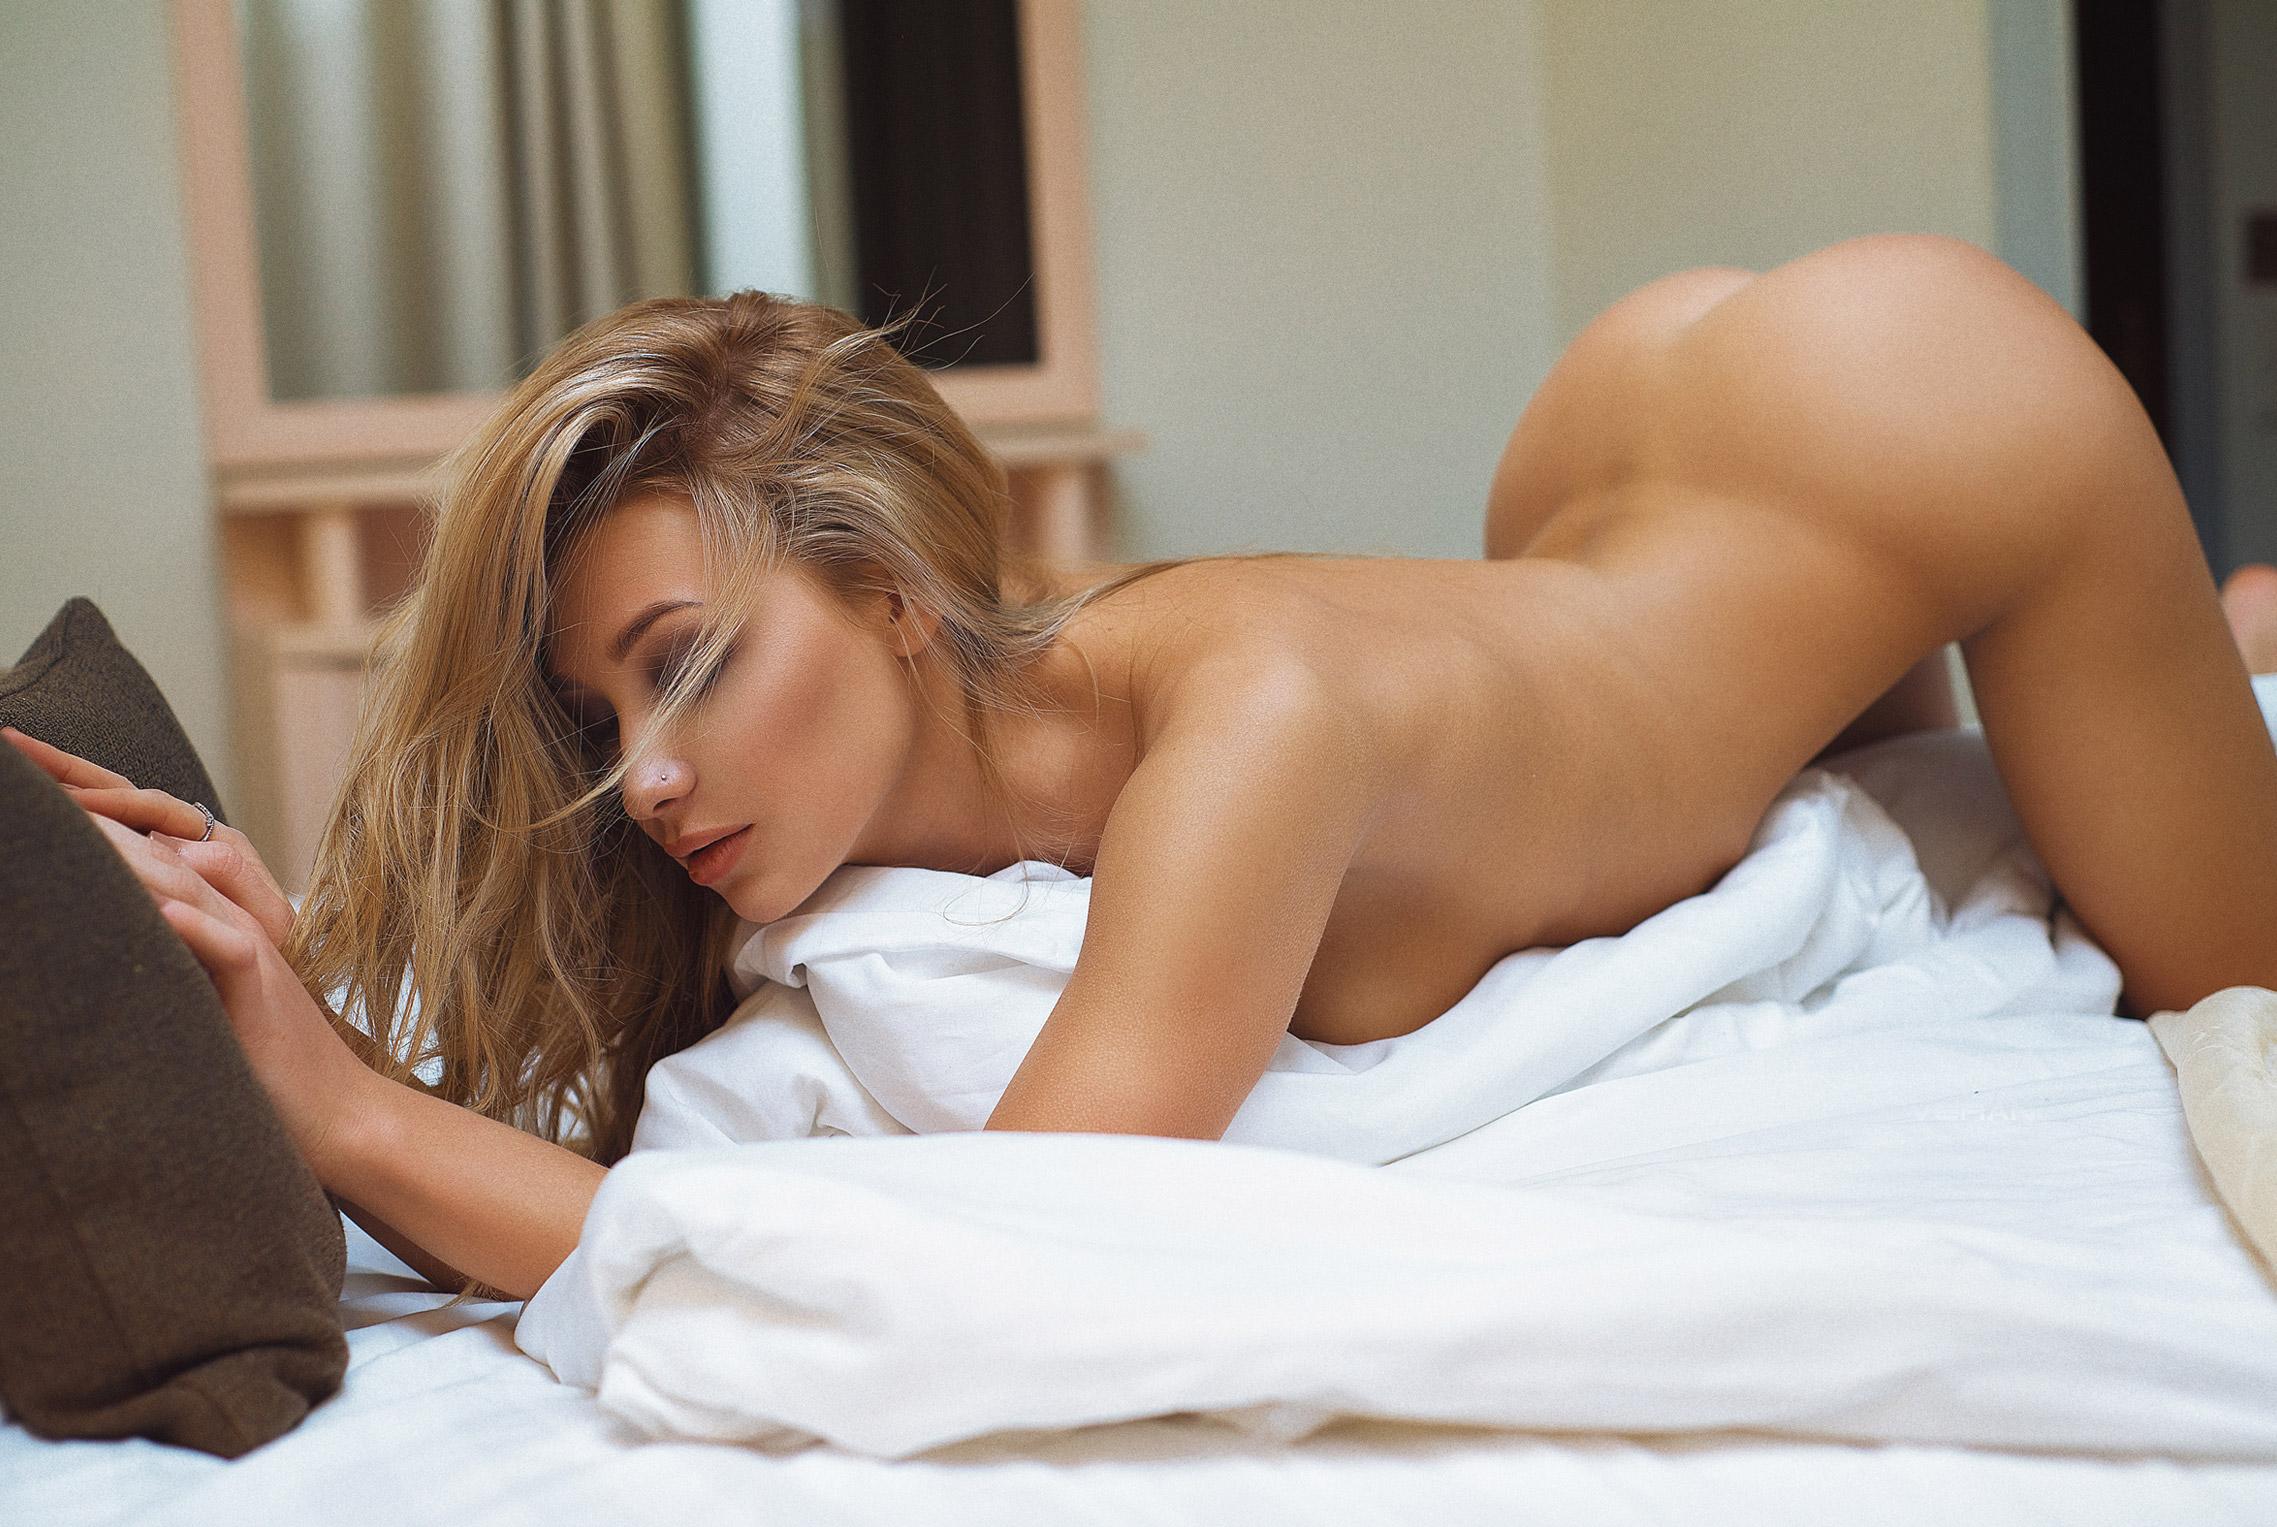 Девушка месяца журнала Playboy Россия - Анжелика Лесик, фотограф Николас Верано / Angelika Lesik nude by Verano